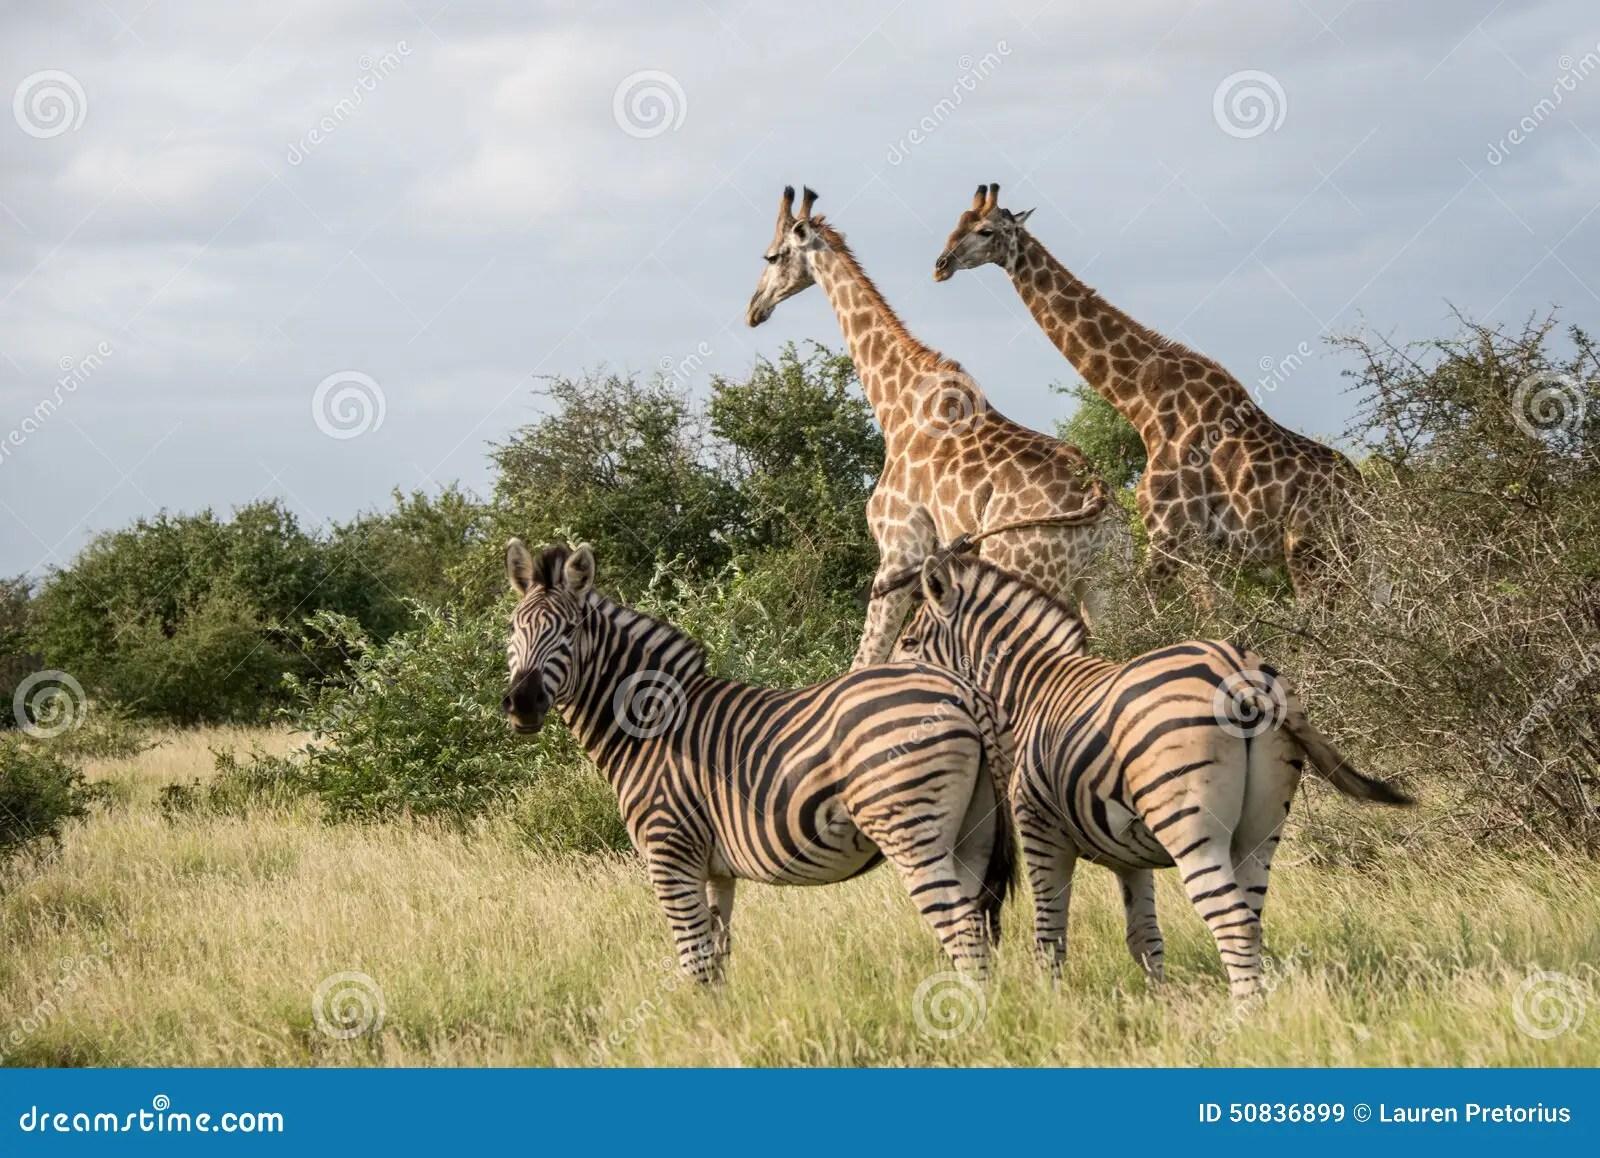 Giraffes And Zebras Stock Image Image Of Head Black